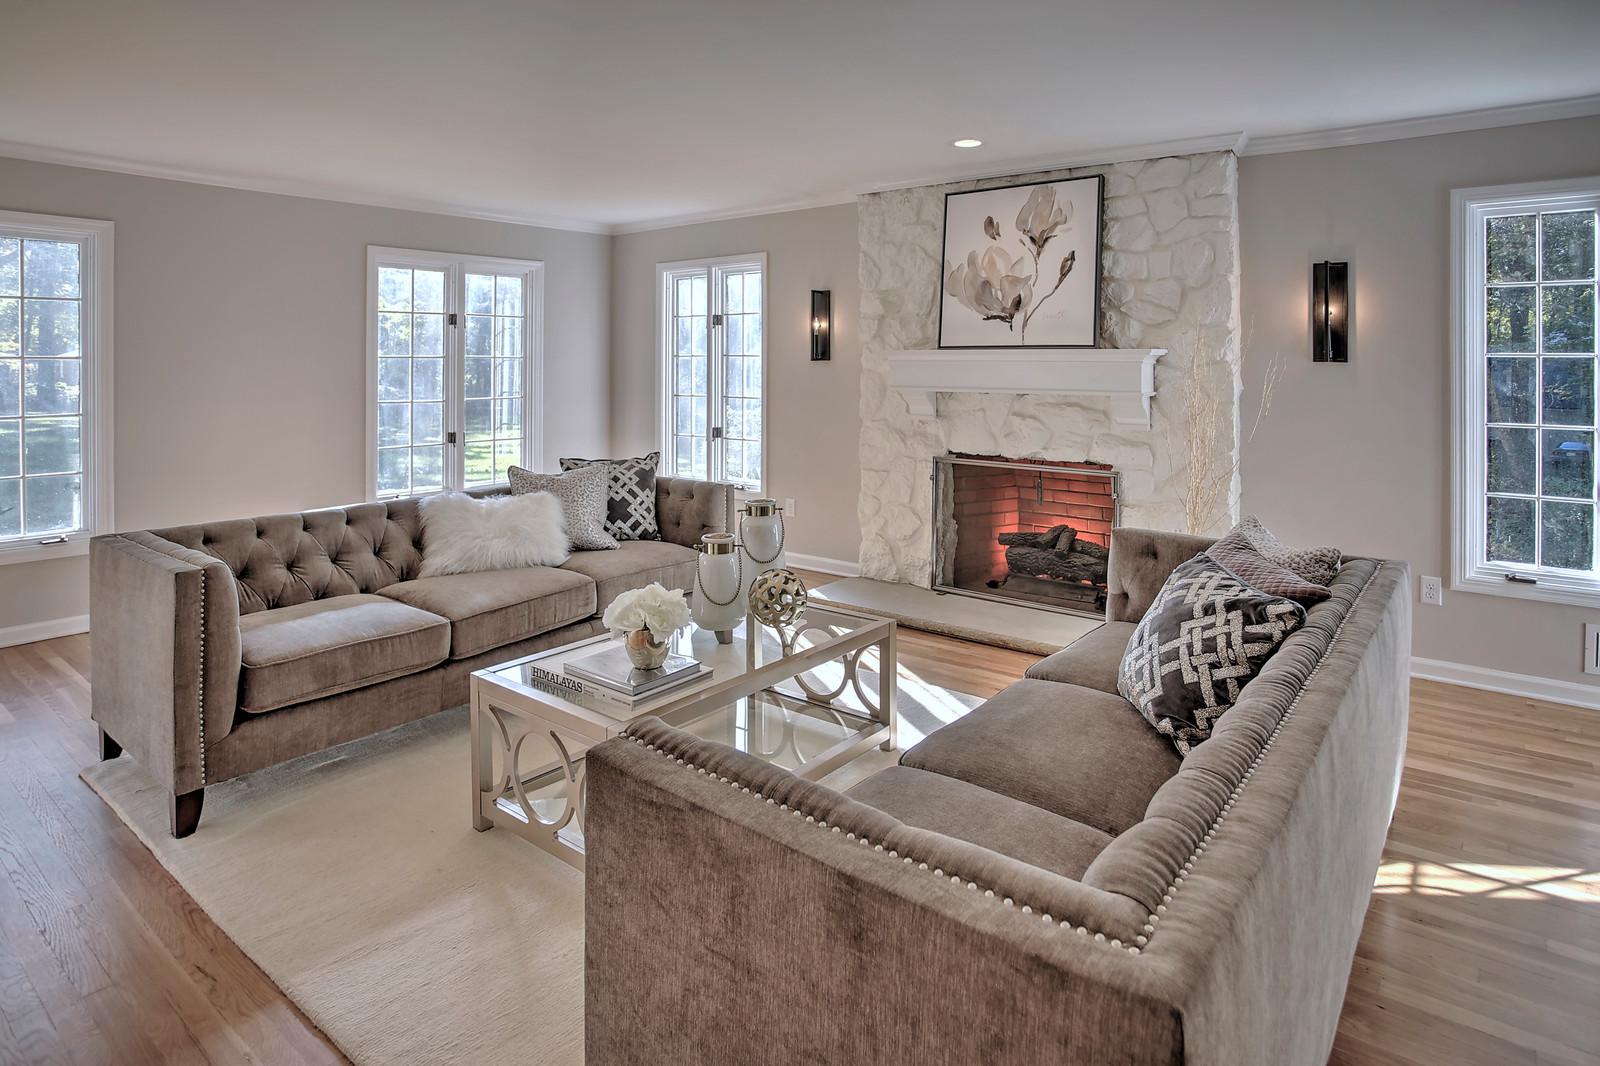 Staged Living Room In Mendham NJ